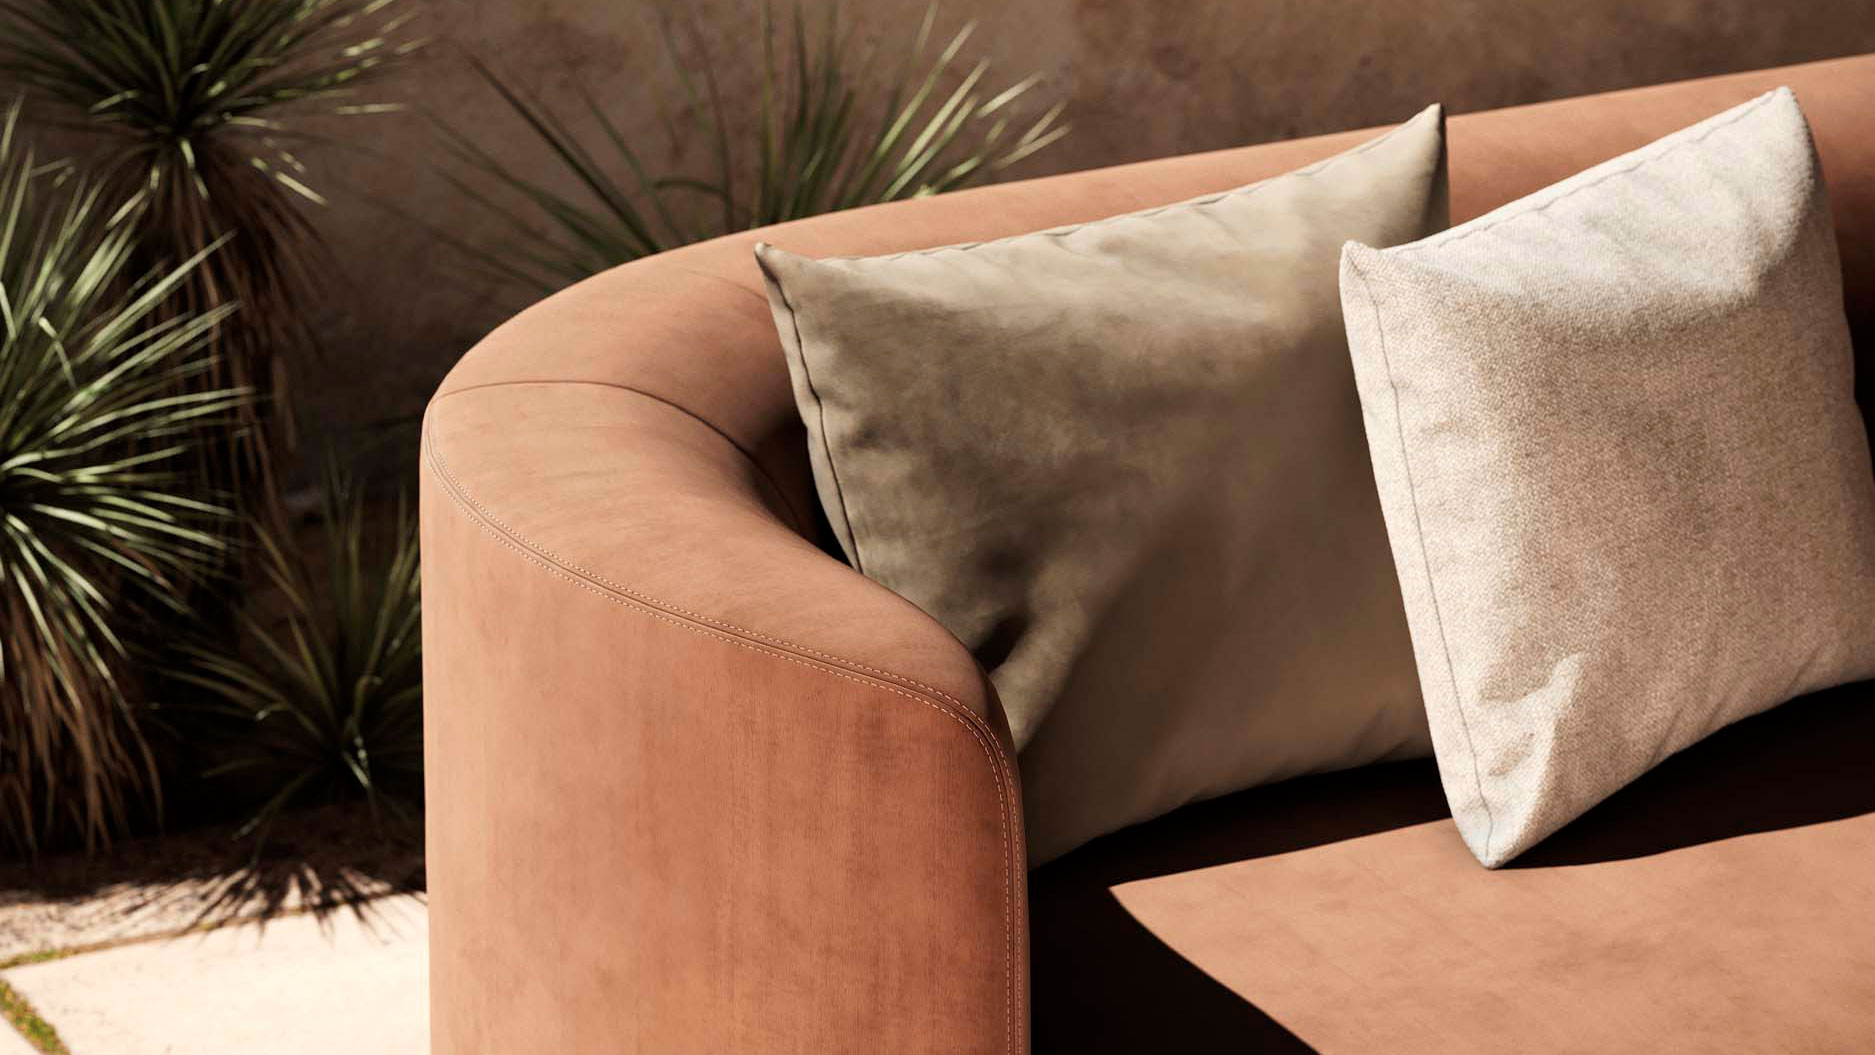 chloe-sofa-domkapa-new-collection-2021-living-room-decor